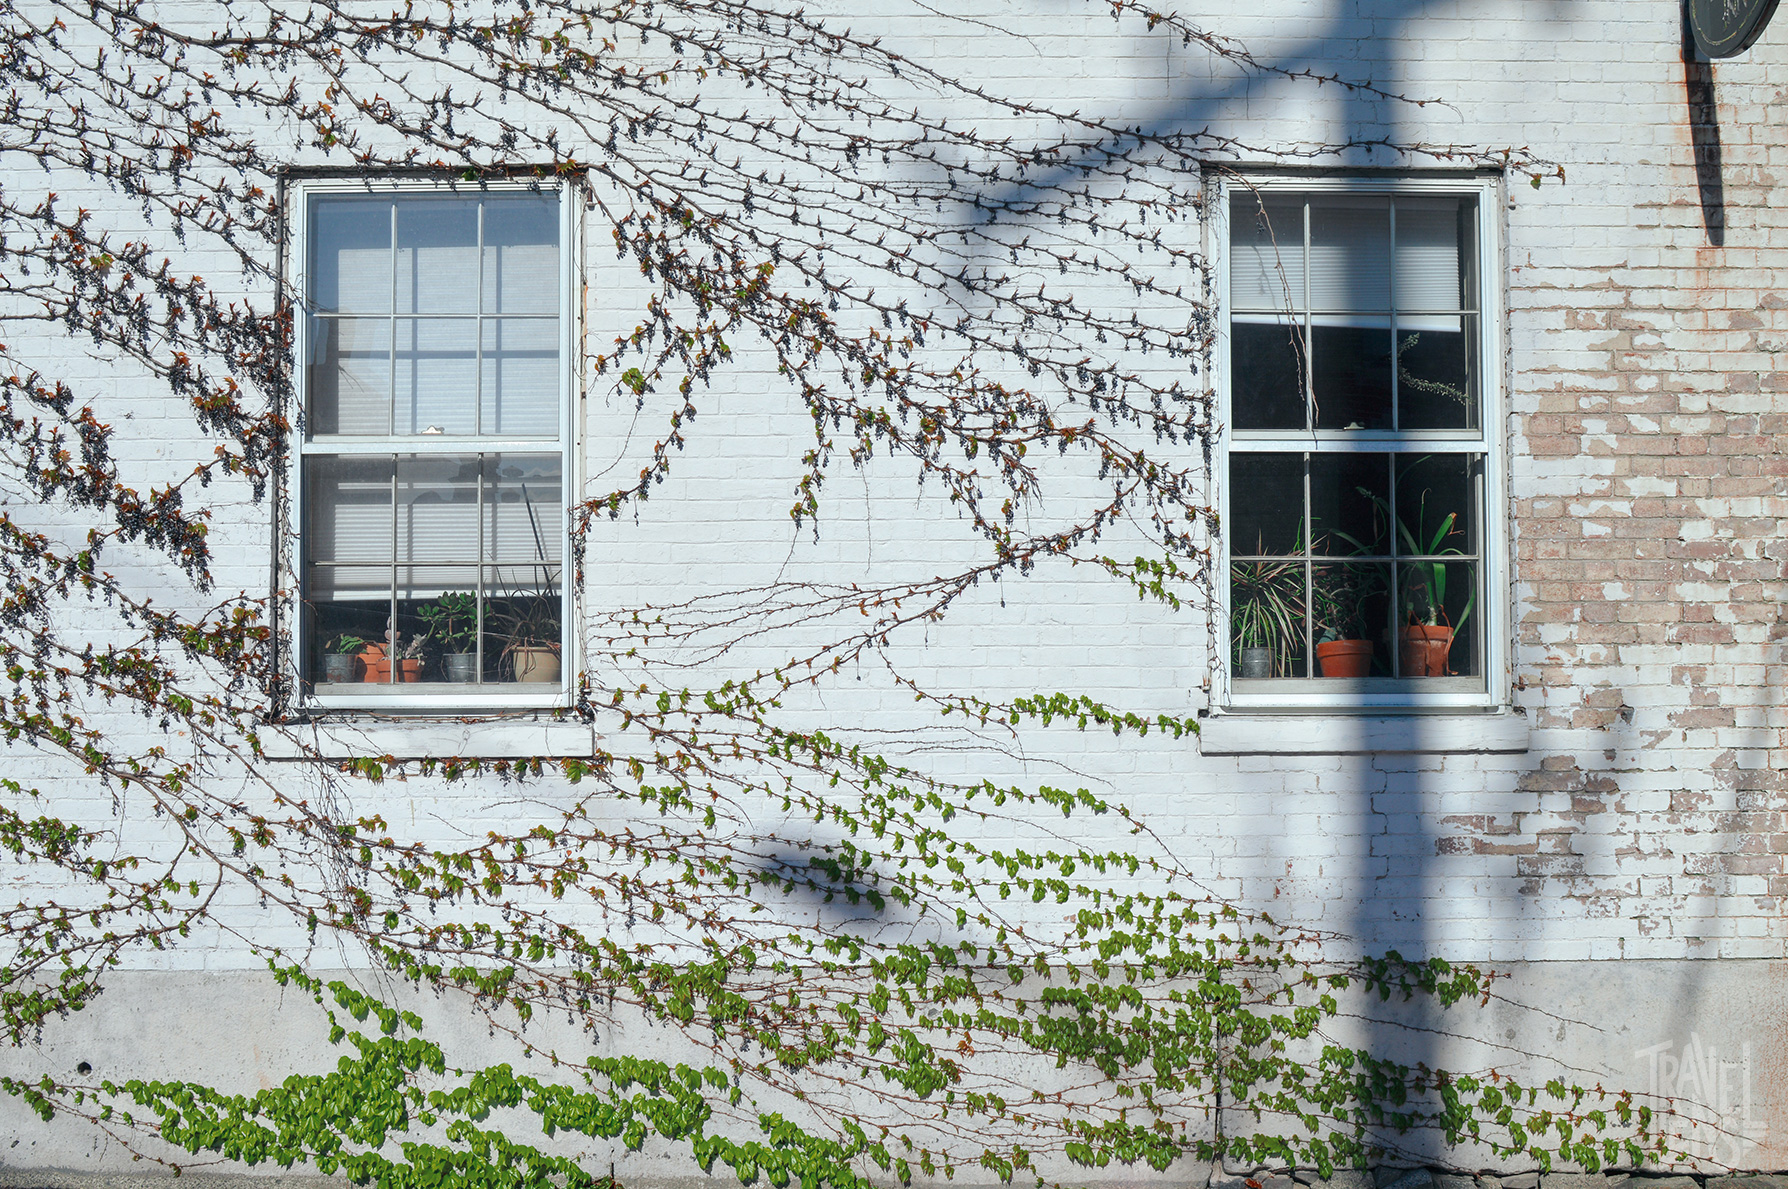 Vines on a white brick building